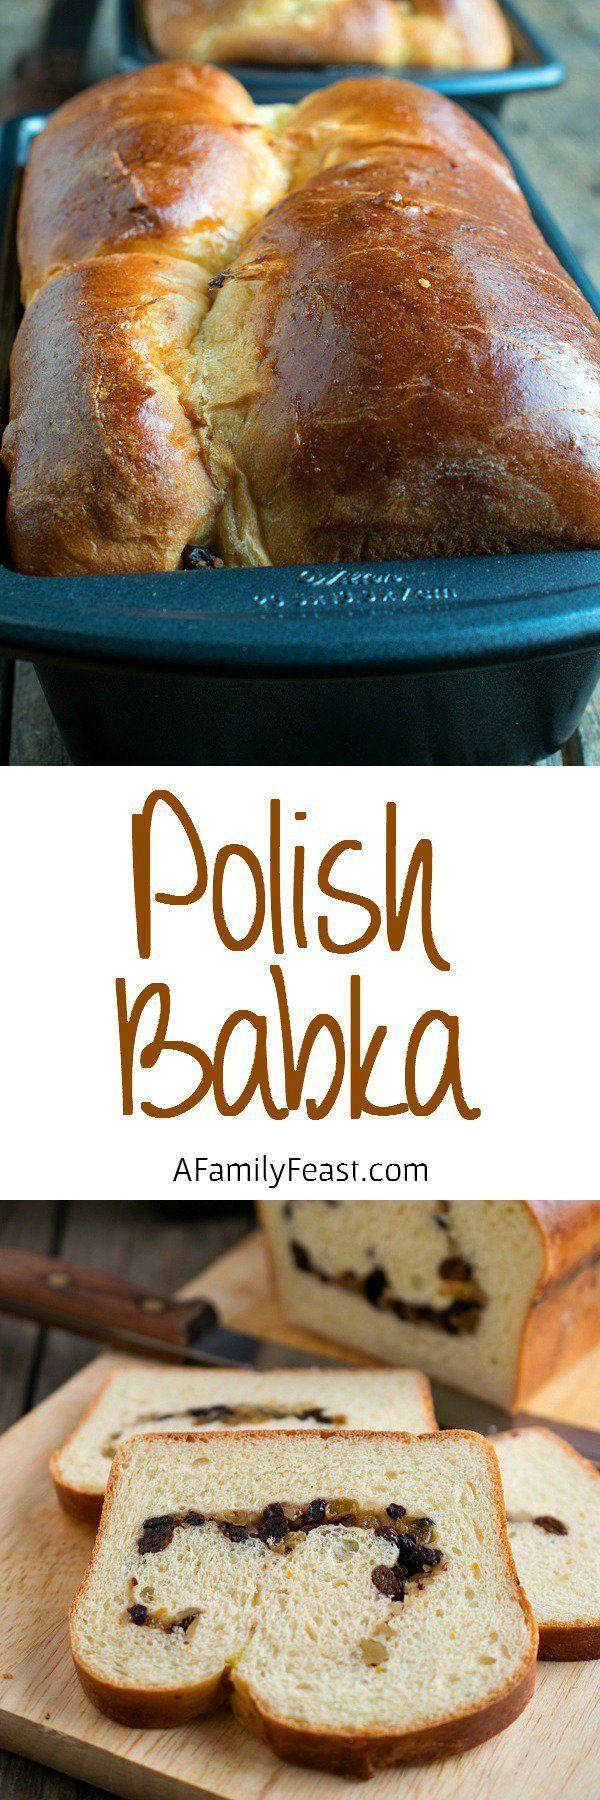 Polish Babka - A traditional bread served on Easter morning.